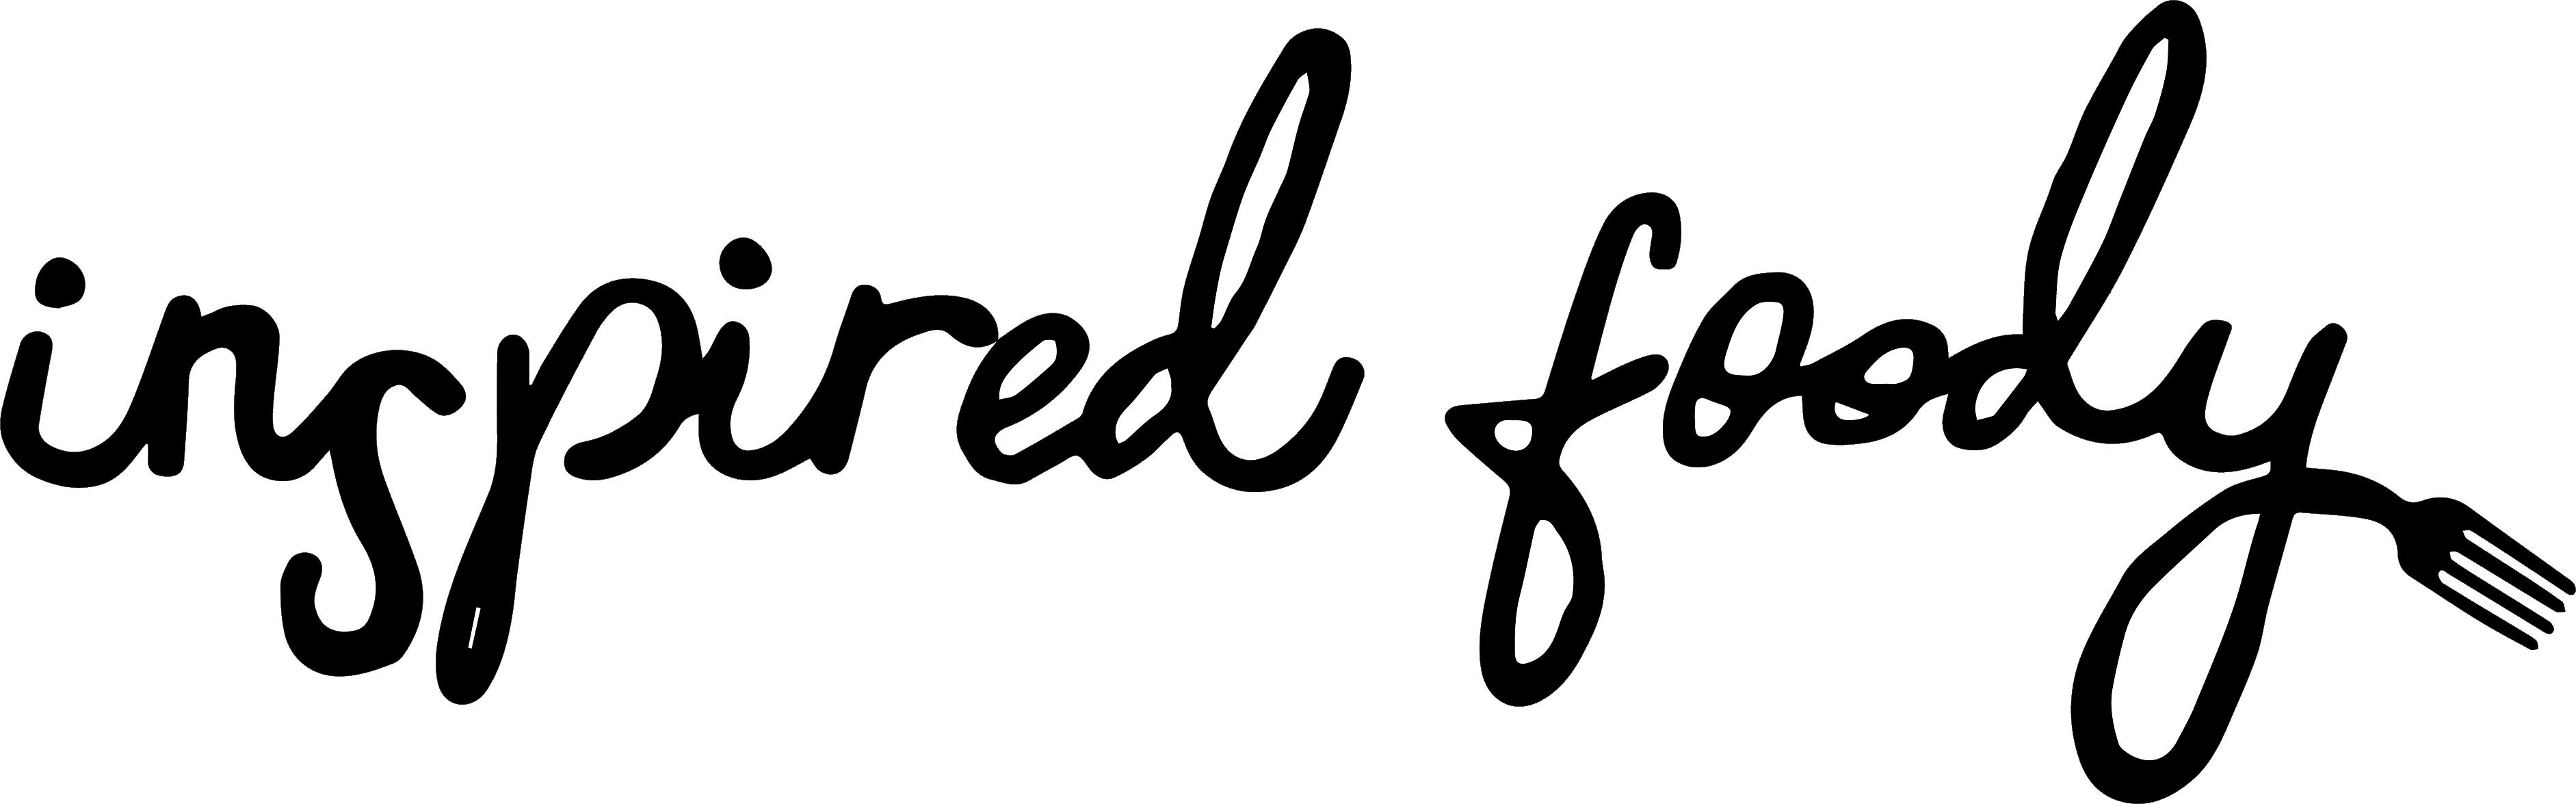 Inspired Foody logo